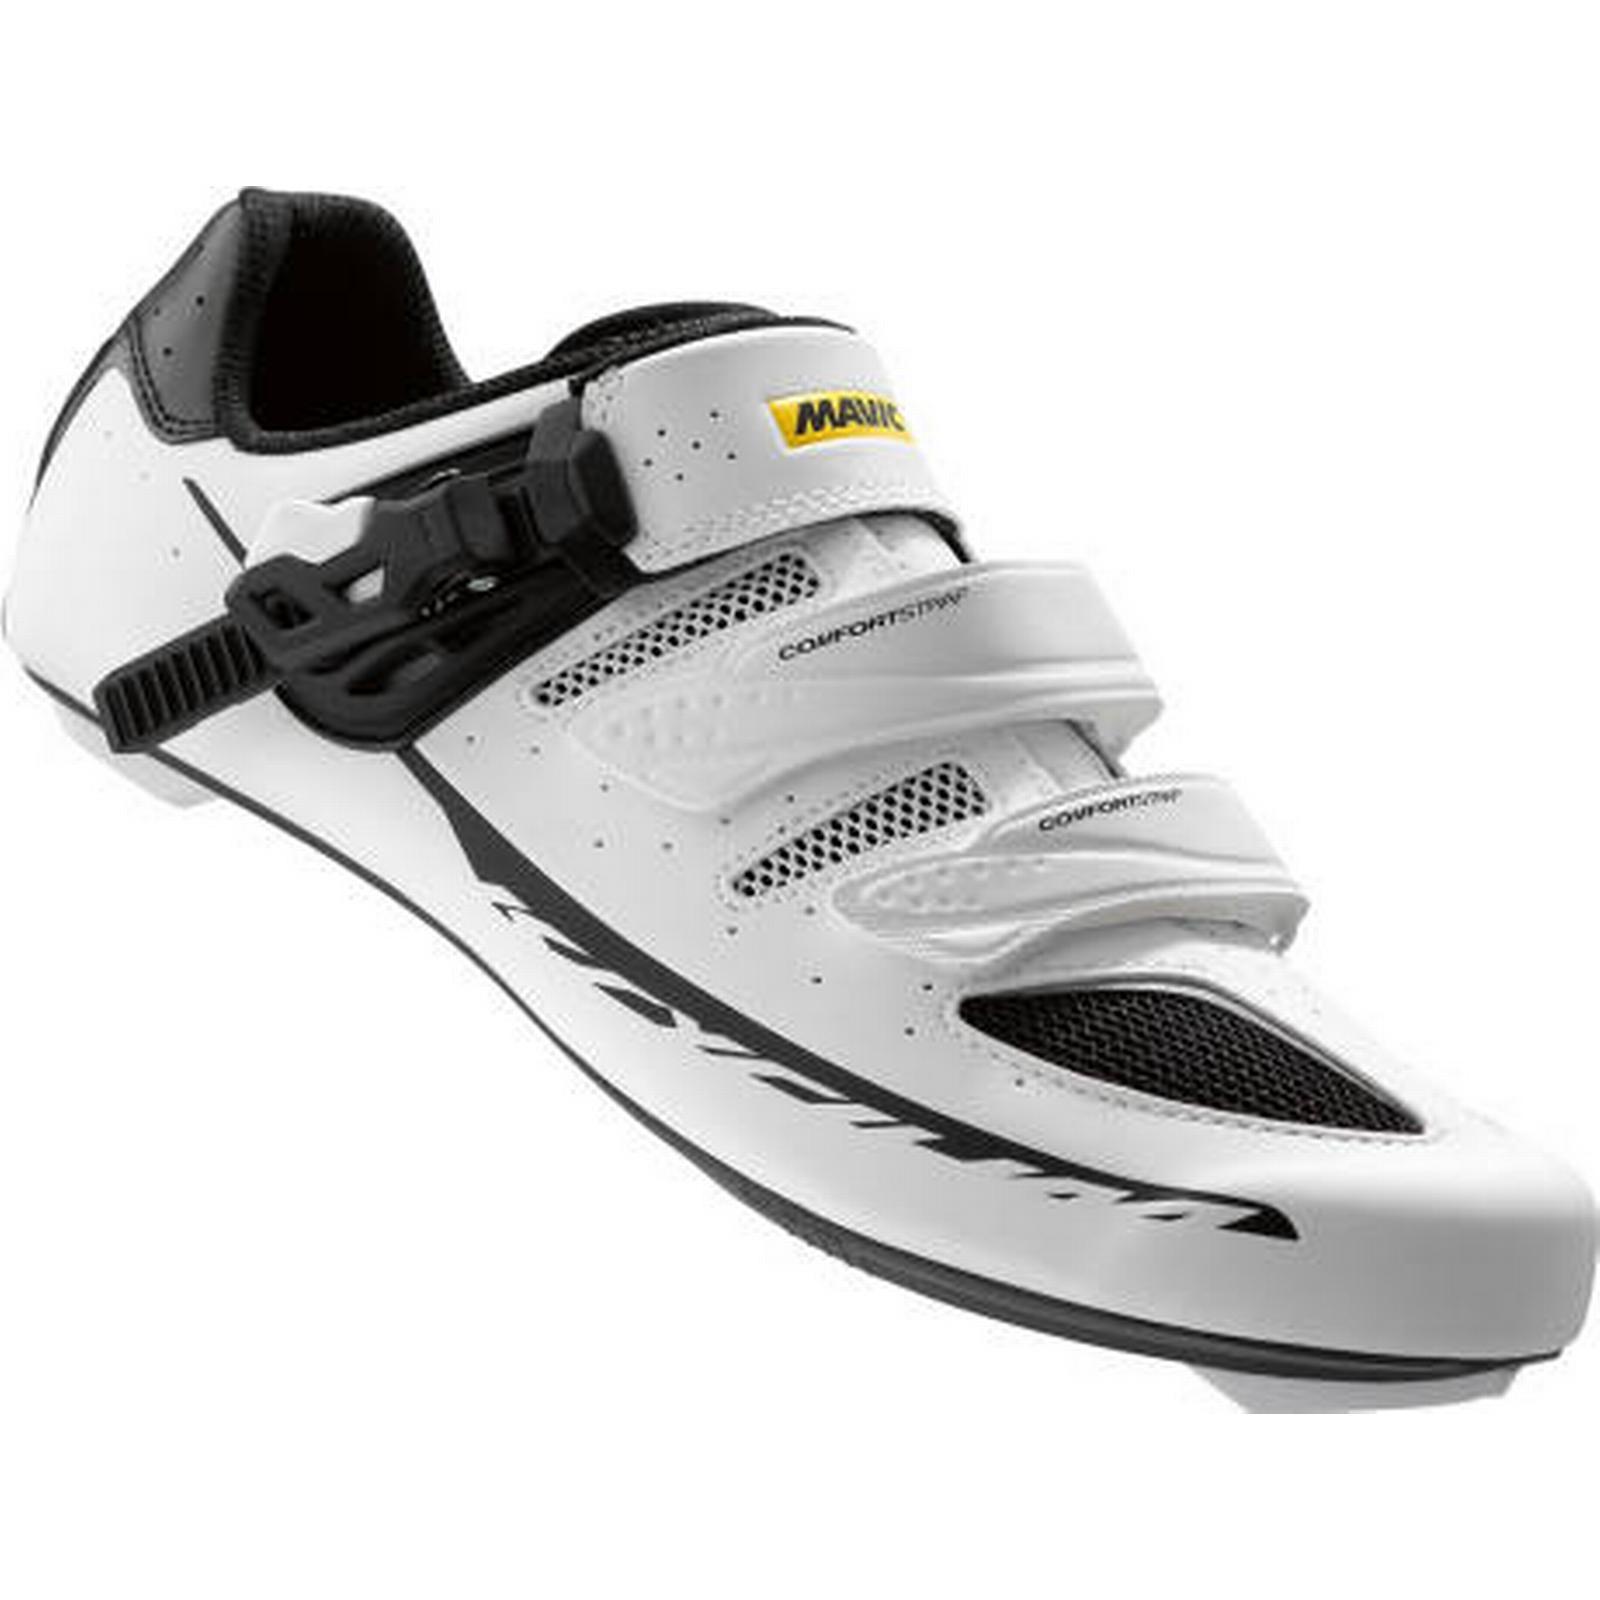 Mavic II Shoes Mavic Ksyrium Elite II Mavic Road Cycling Shoes 2016 - White / Black / EU43 1/3 880ca6